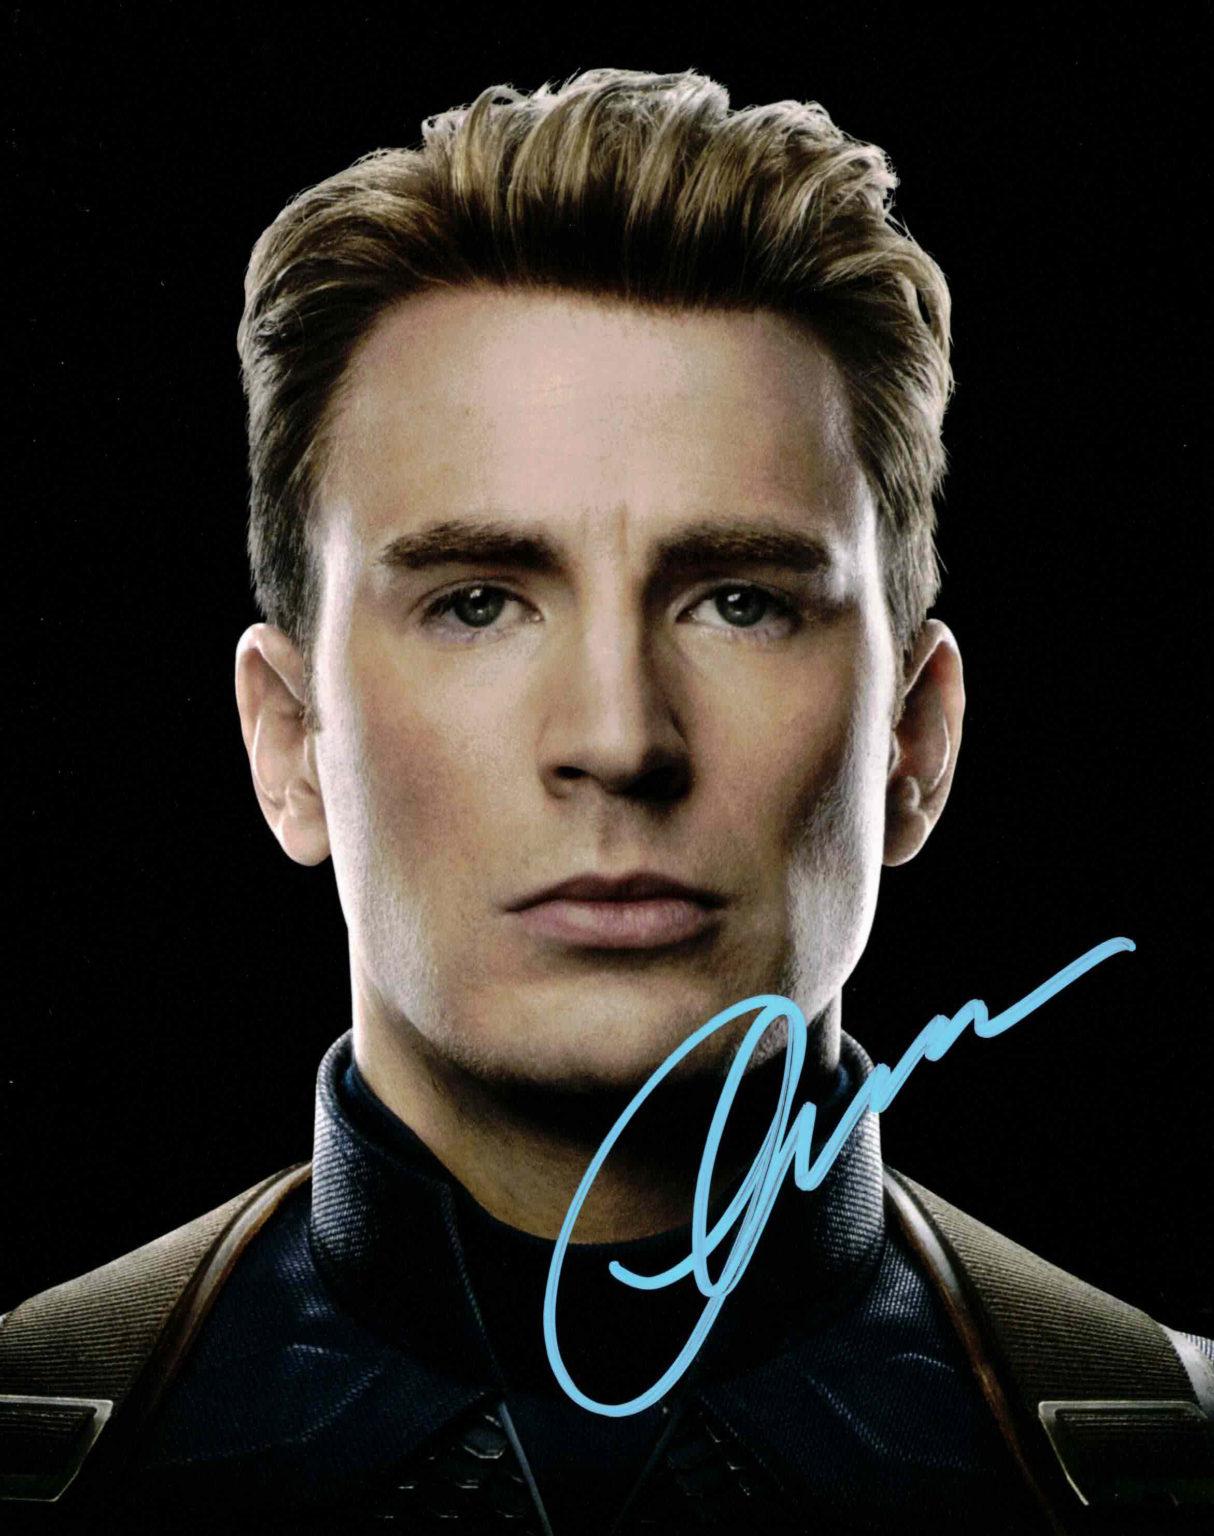 Chris Evans / Cpt. America, Avengers - autogram